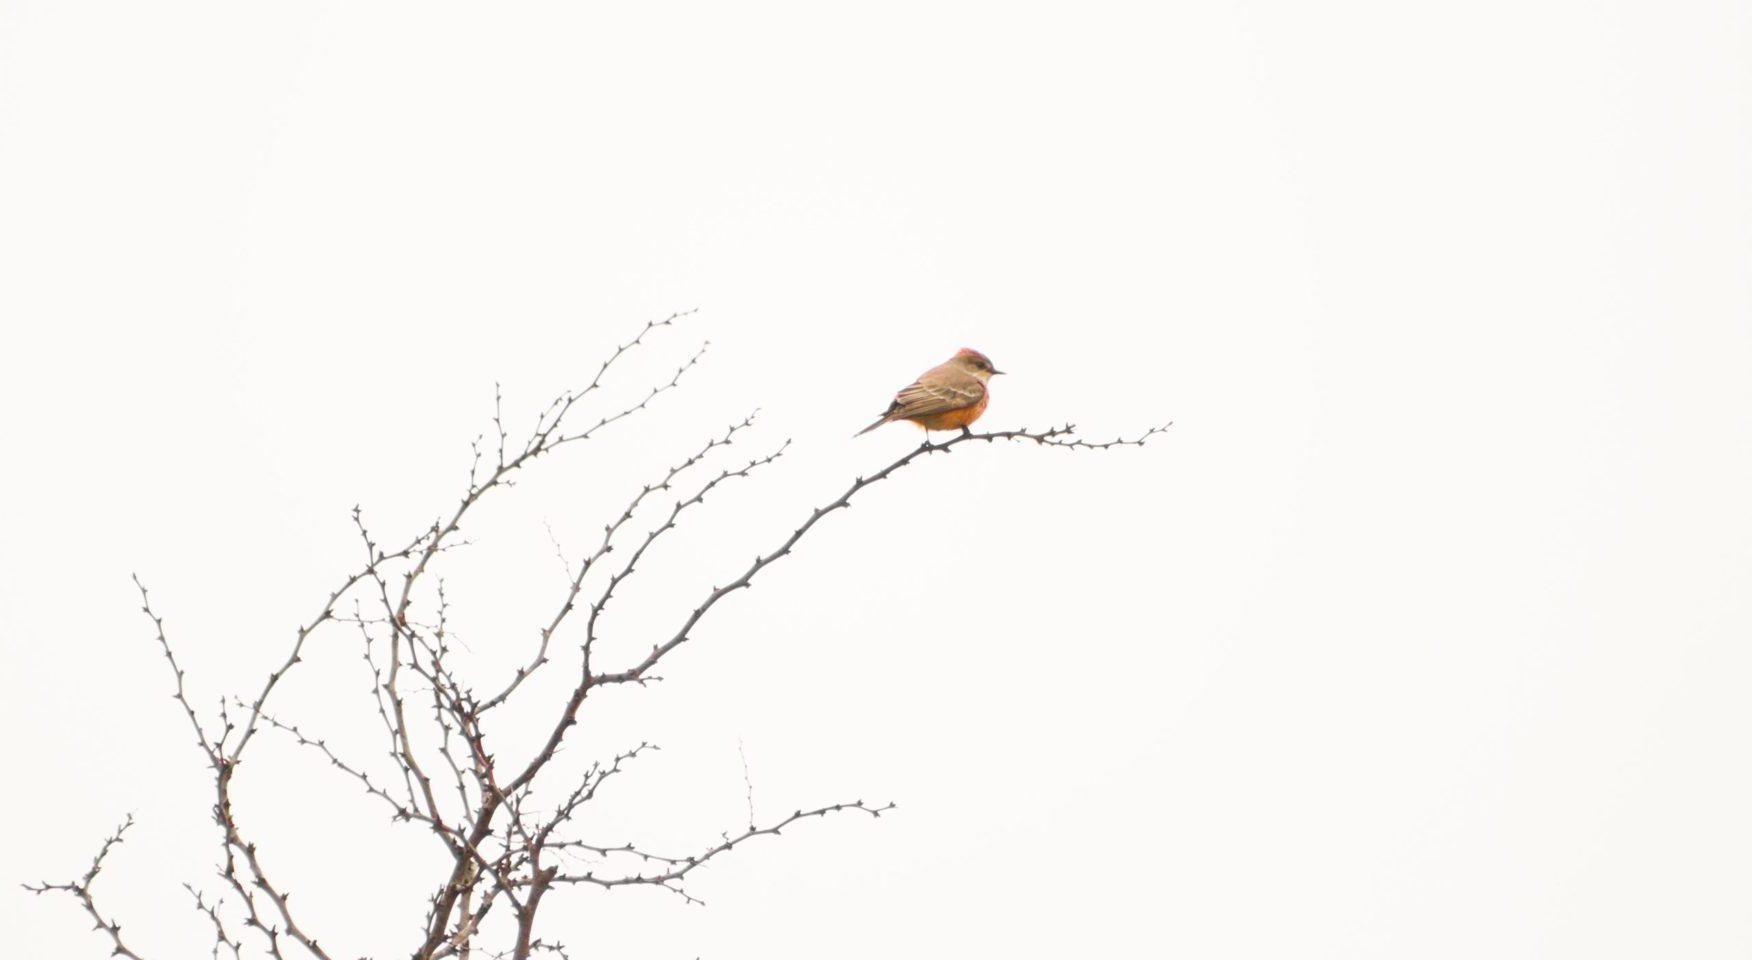 Lone bird in bare winter tree